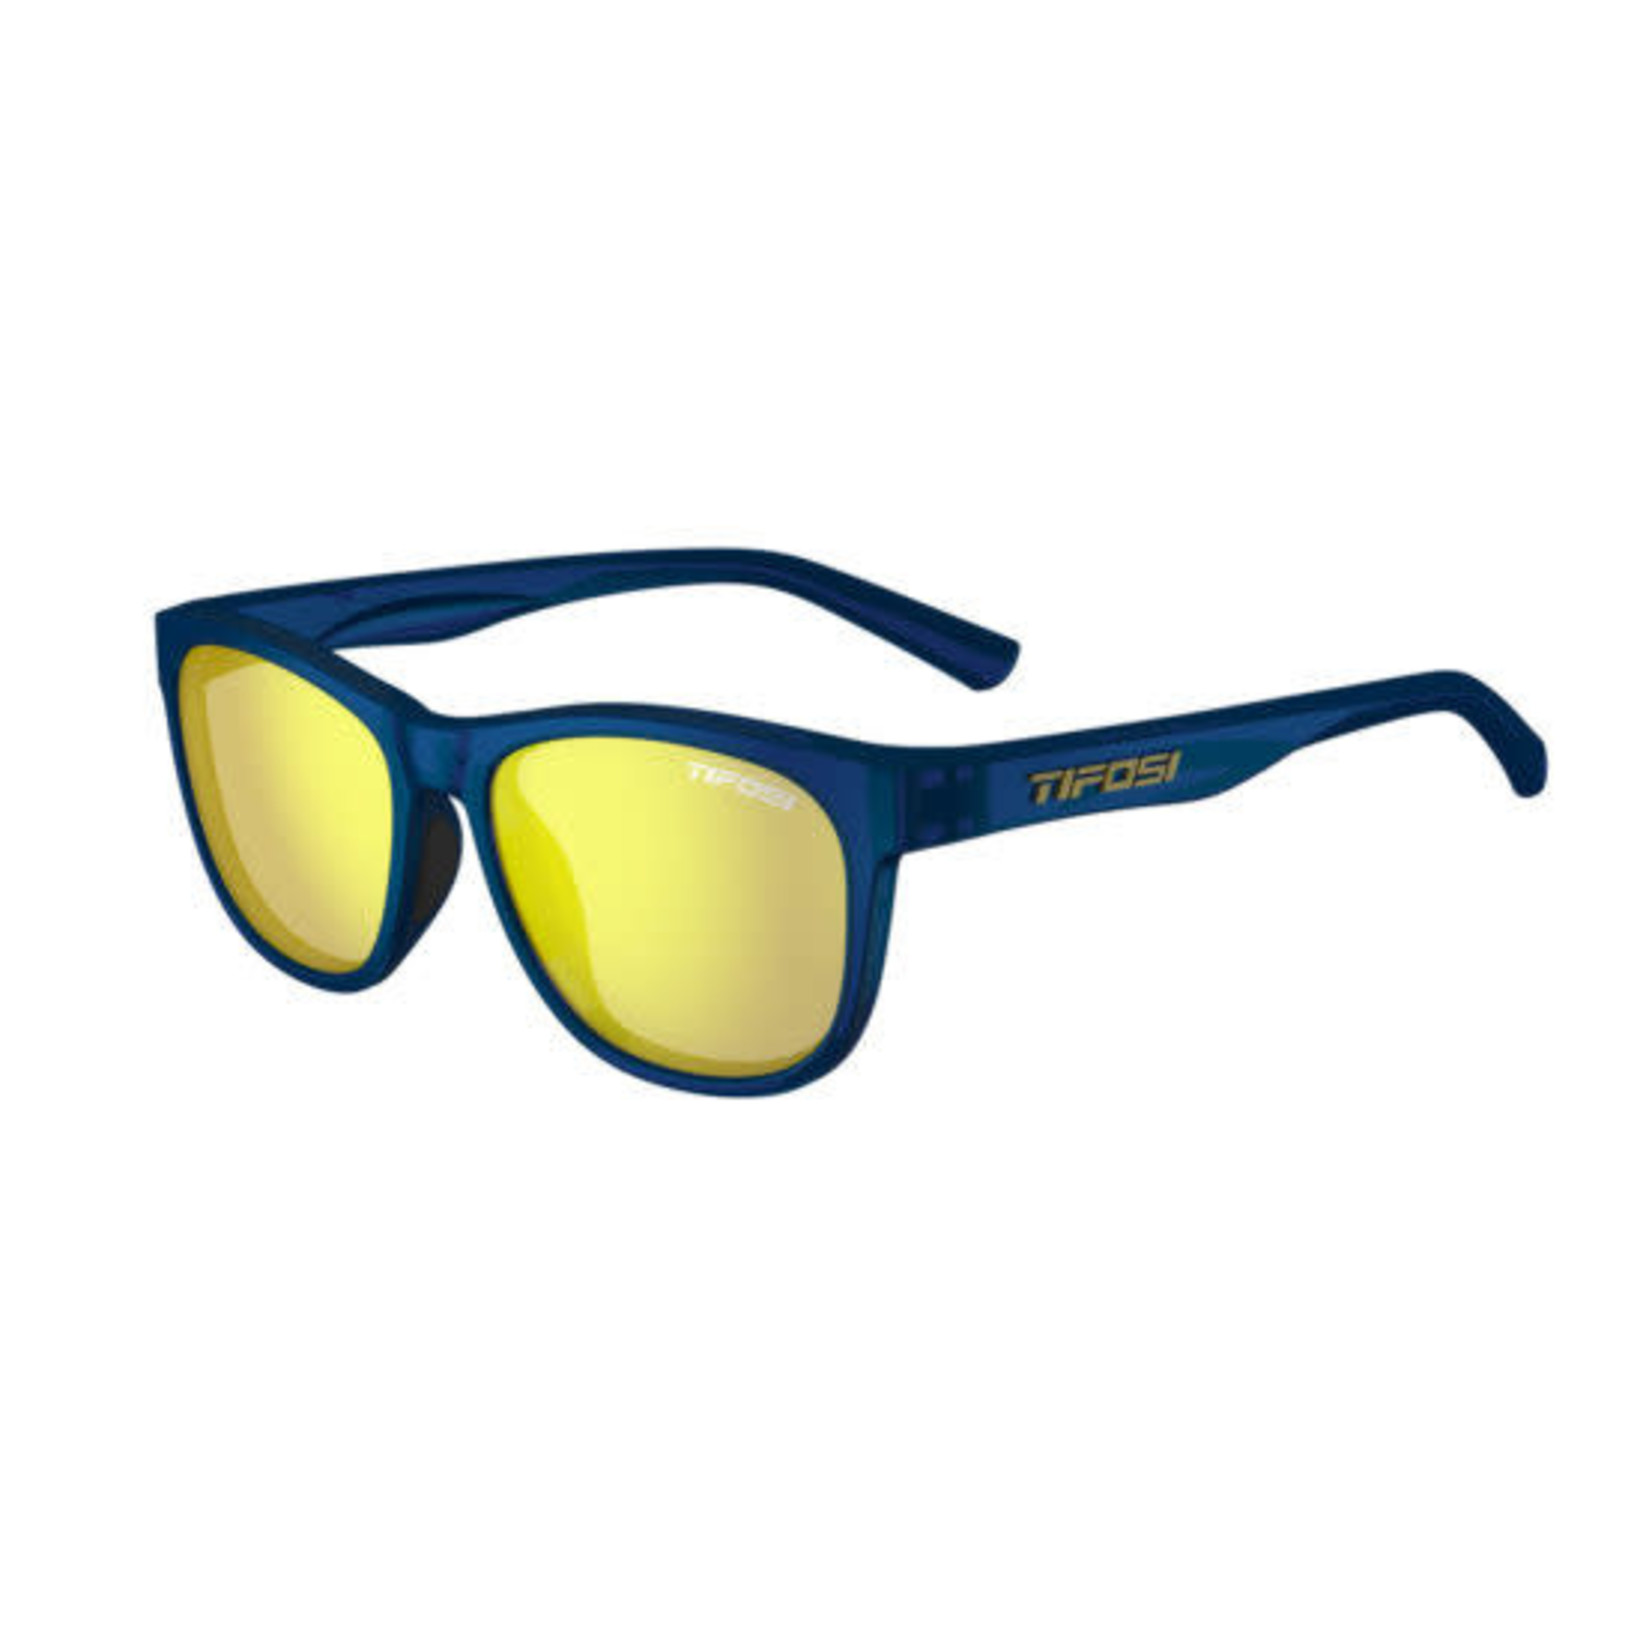 Tifosi Optics Swank, Midnight Navy Single Lens Sunglasses